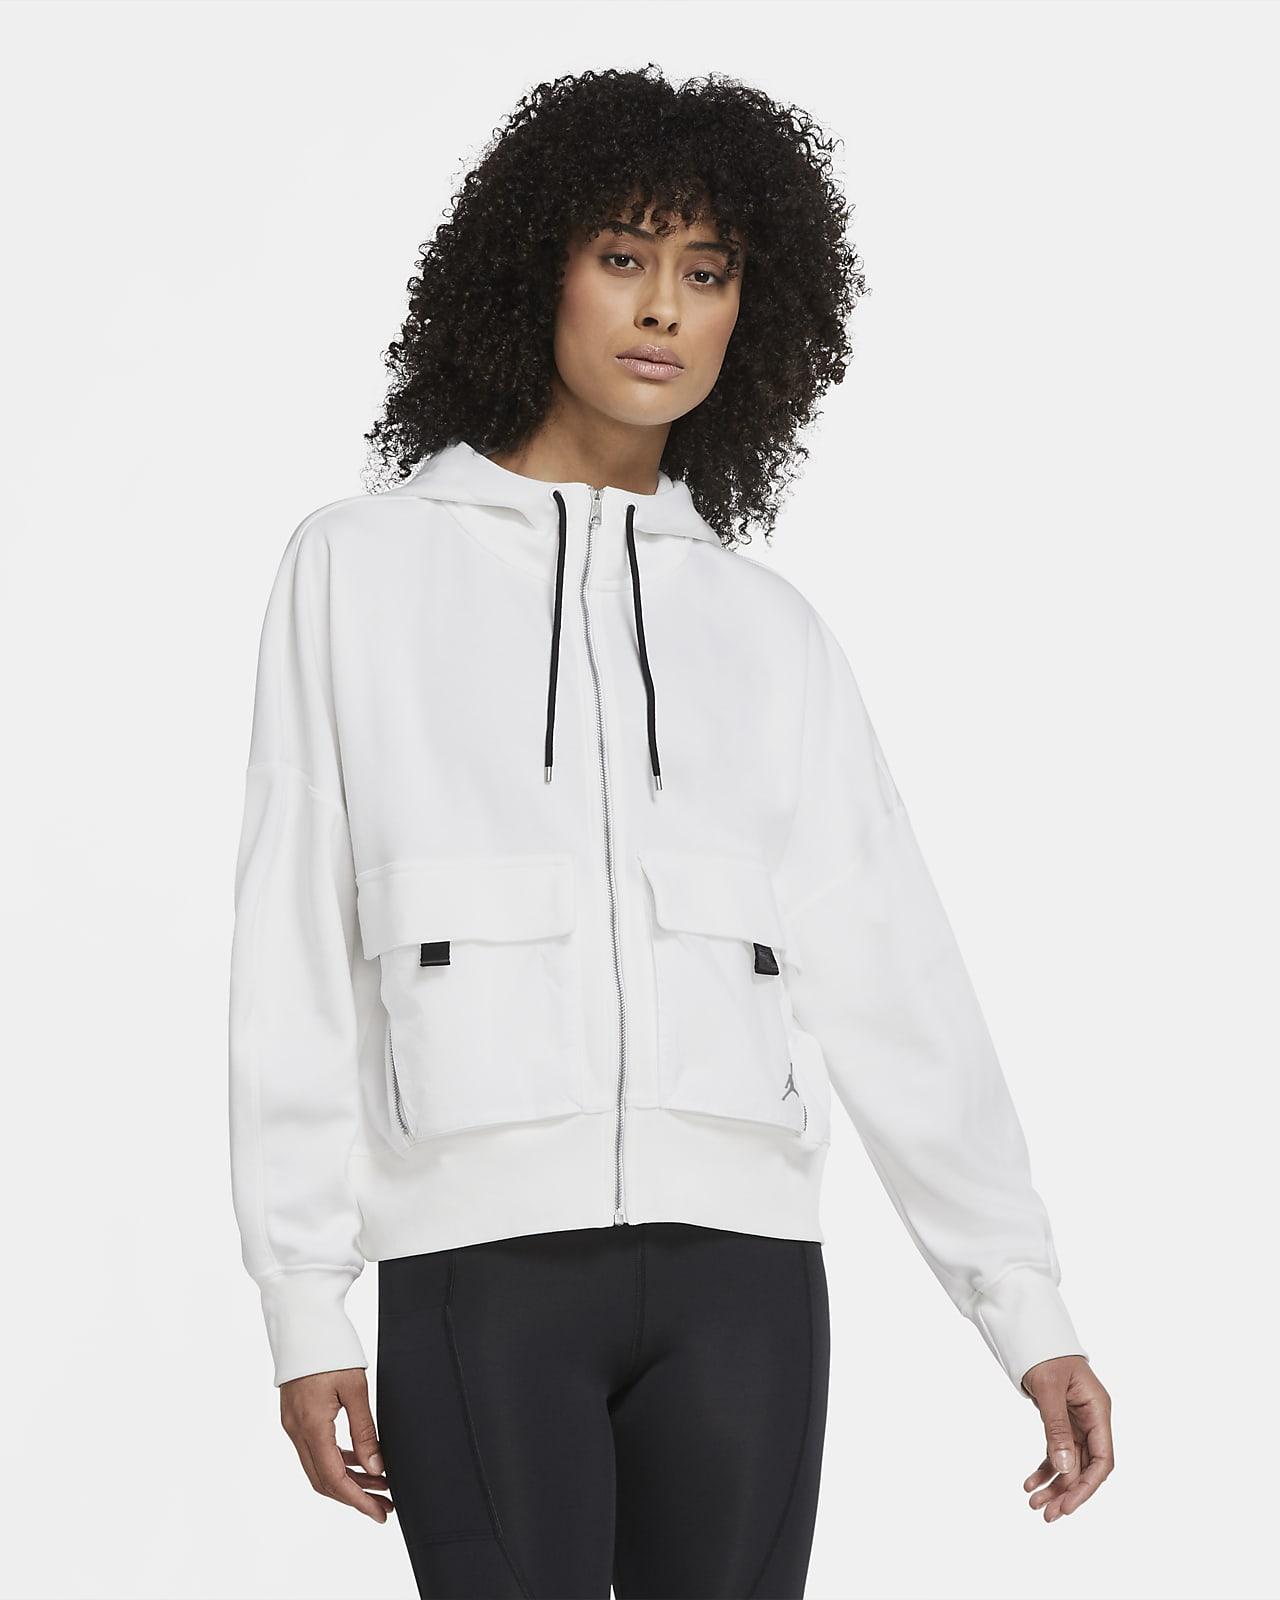 Jordan Women's Full-Zip Hoodie